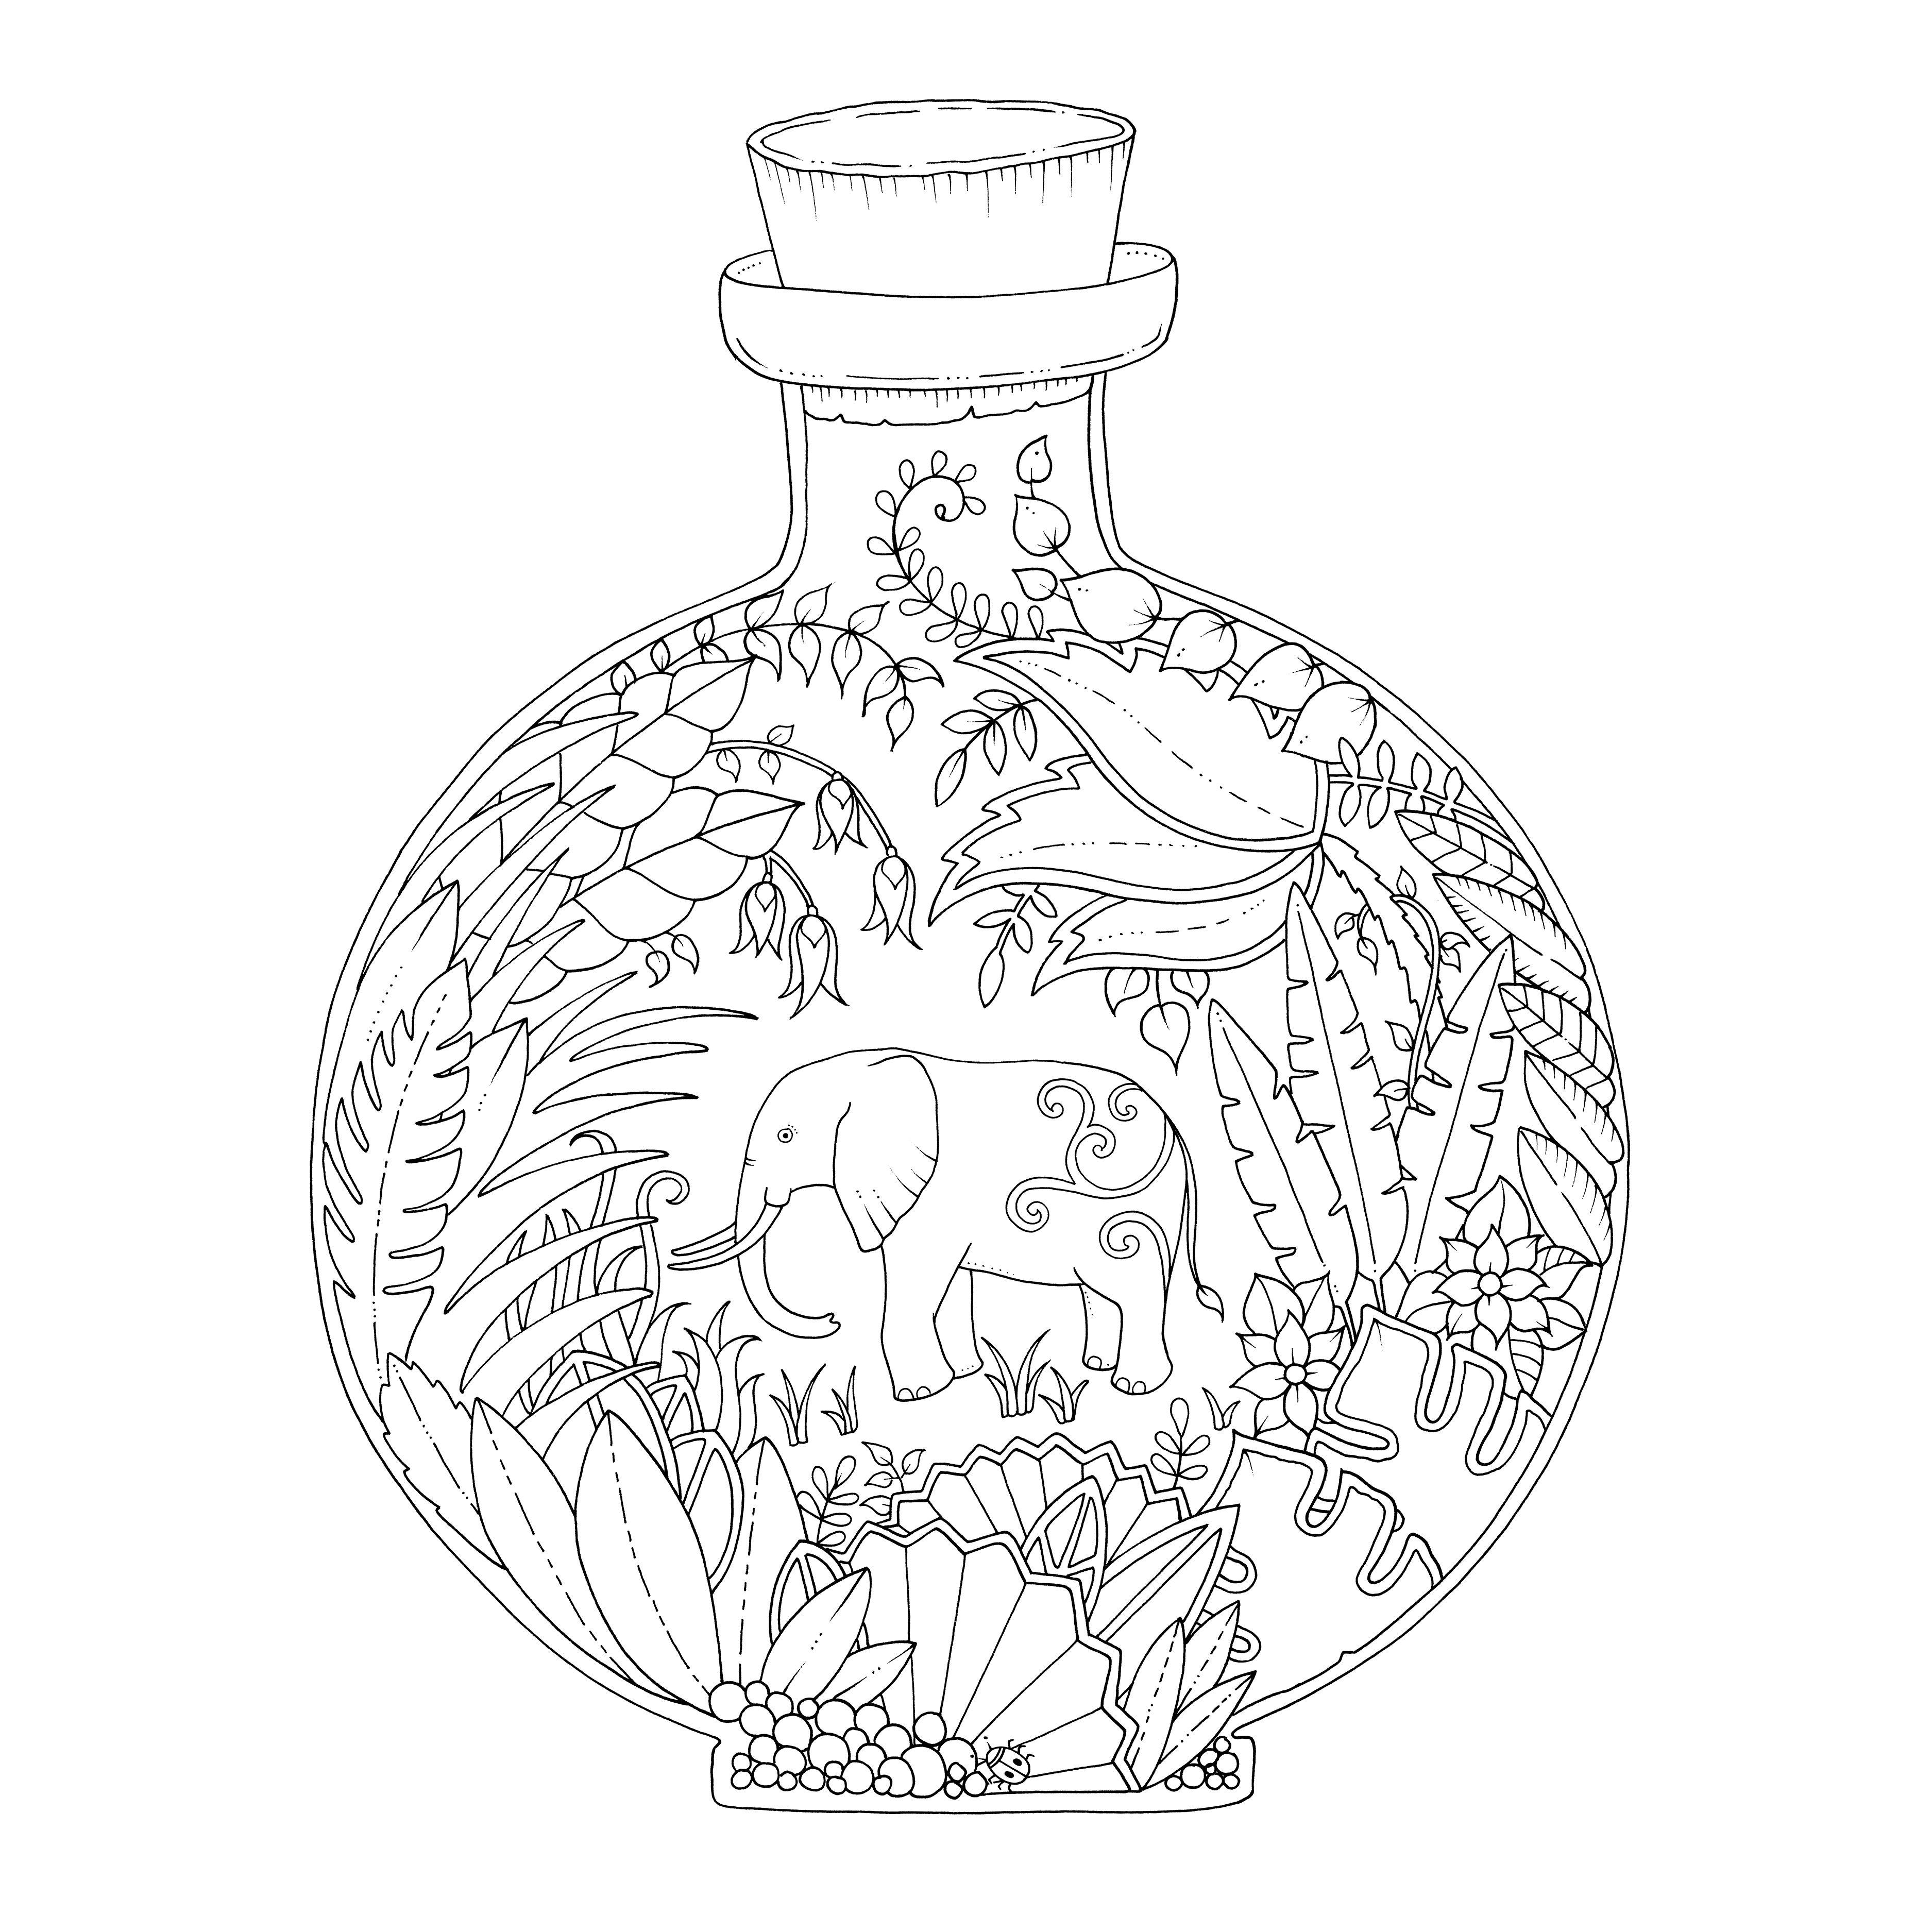 La jungla mágica\' de Johanna Basford (Urano) | Mandalas | Pinterest ...